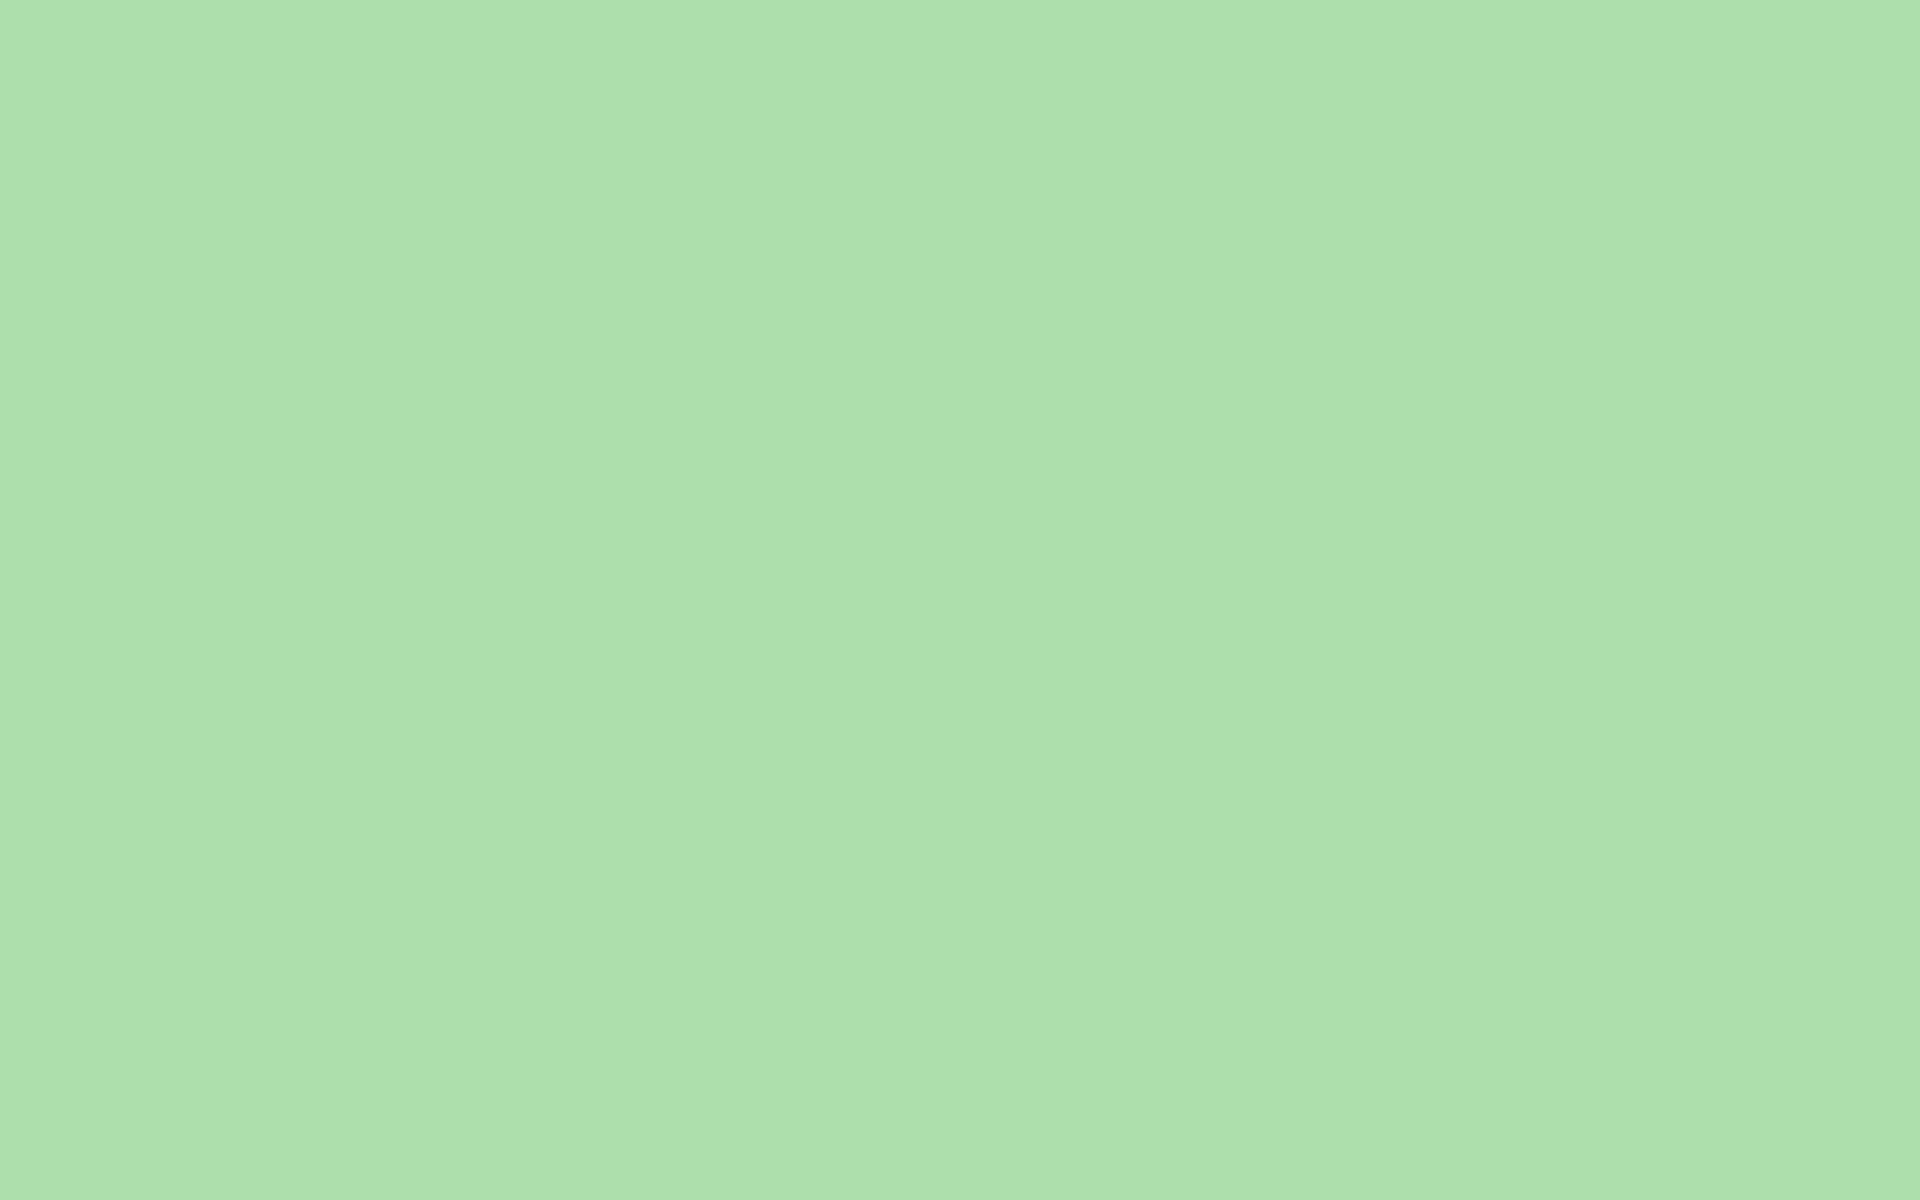 light green solid color wallpaper 49783 51462 hd wallpapersjpg 1920x1200